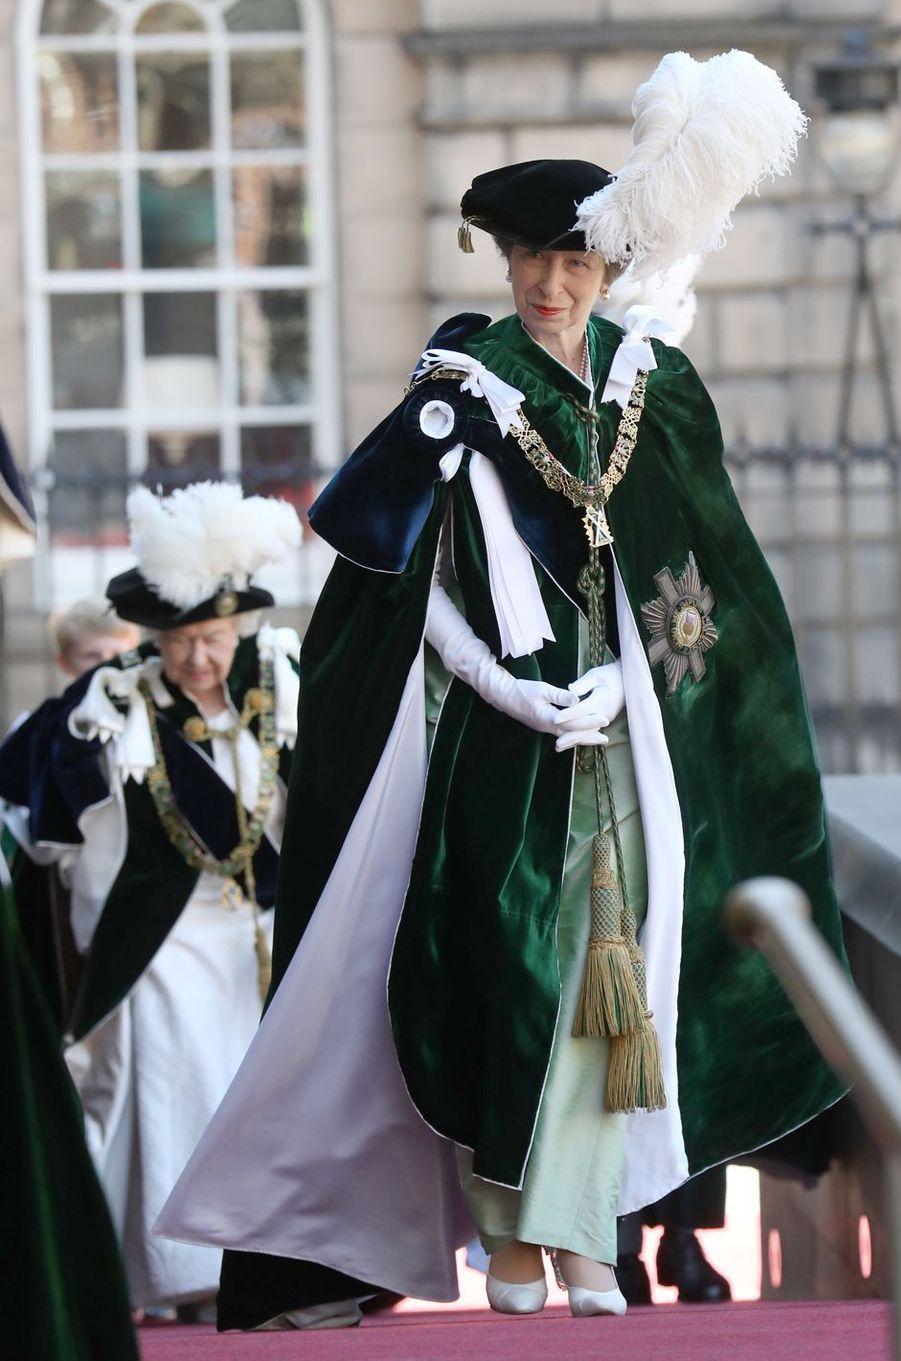 La princesse Anne et la reine Elizabeth II à Edimbourg, le 6 juillet 2018